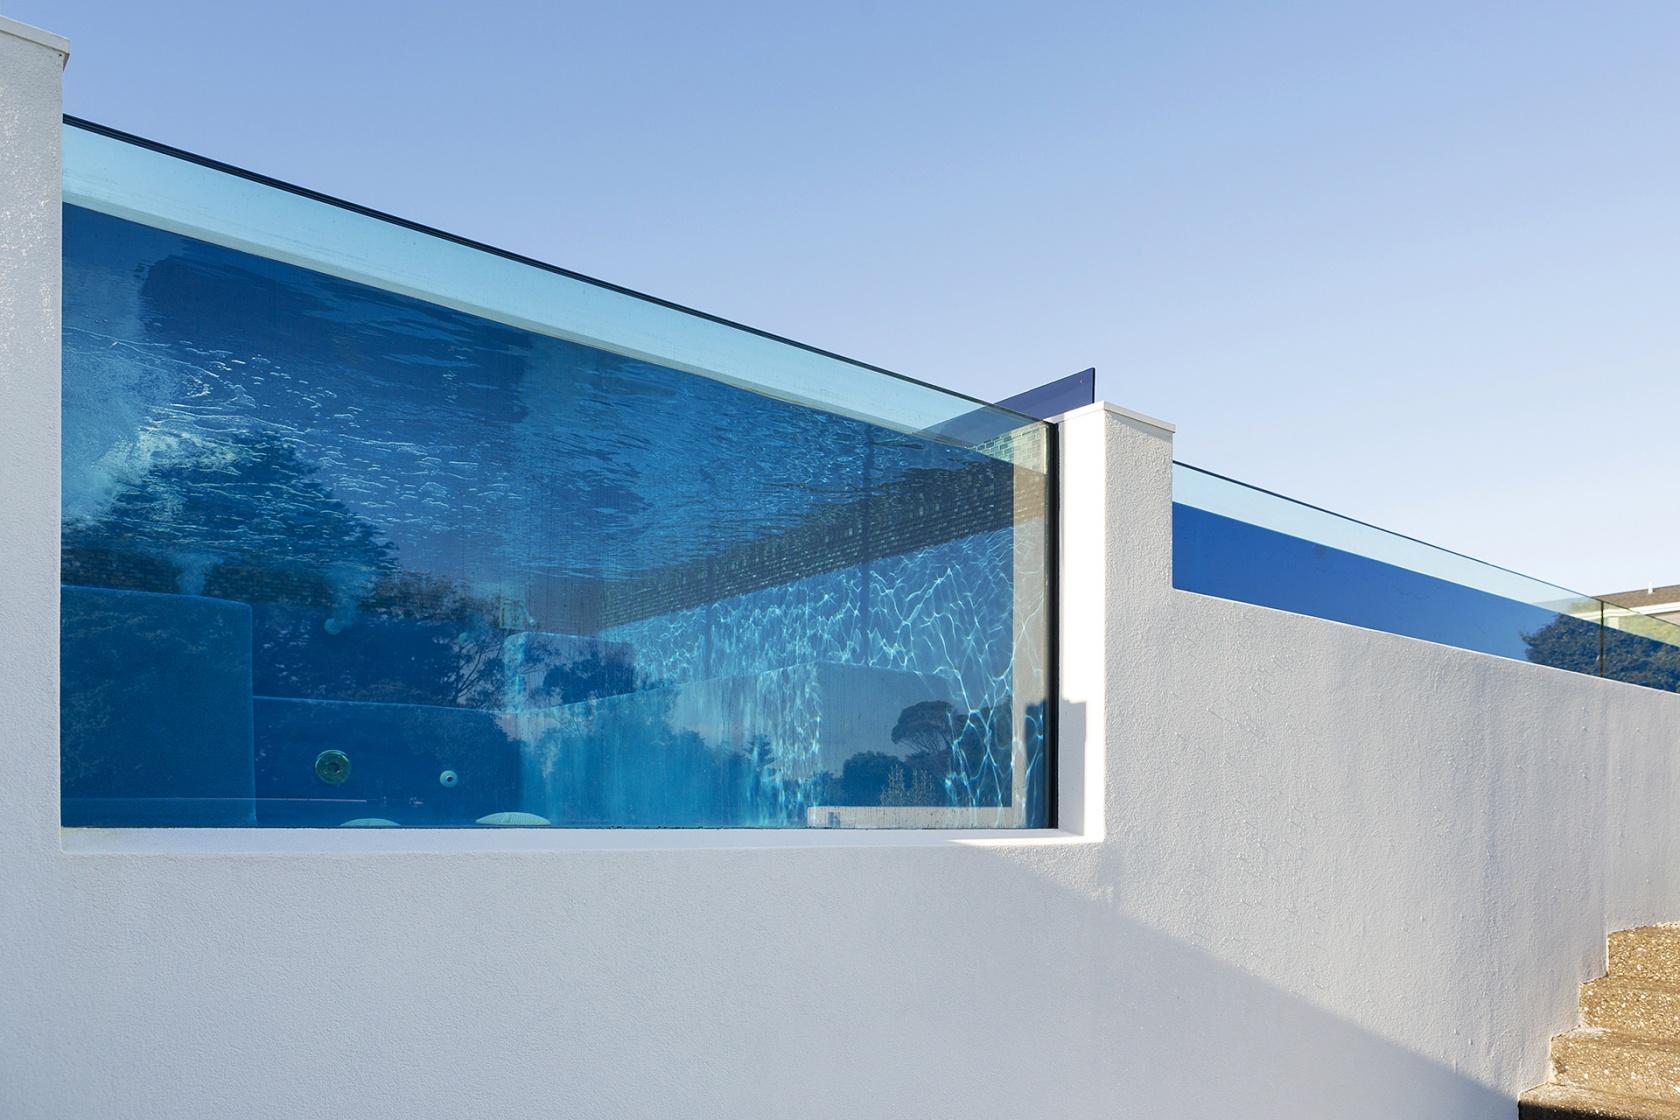 Pool Spa Glass Side Oceanbeach